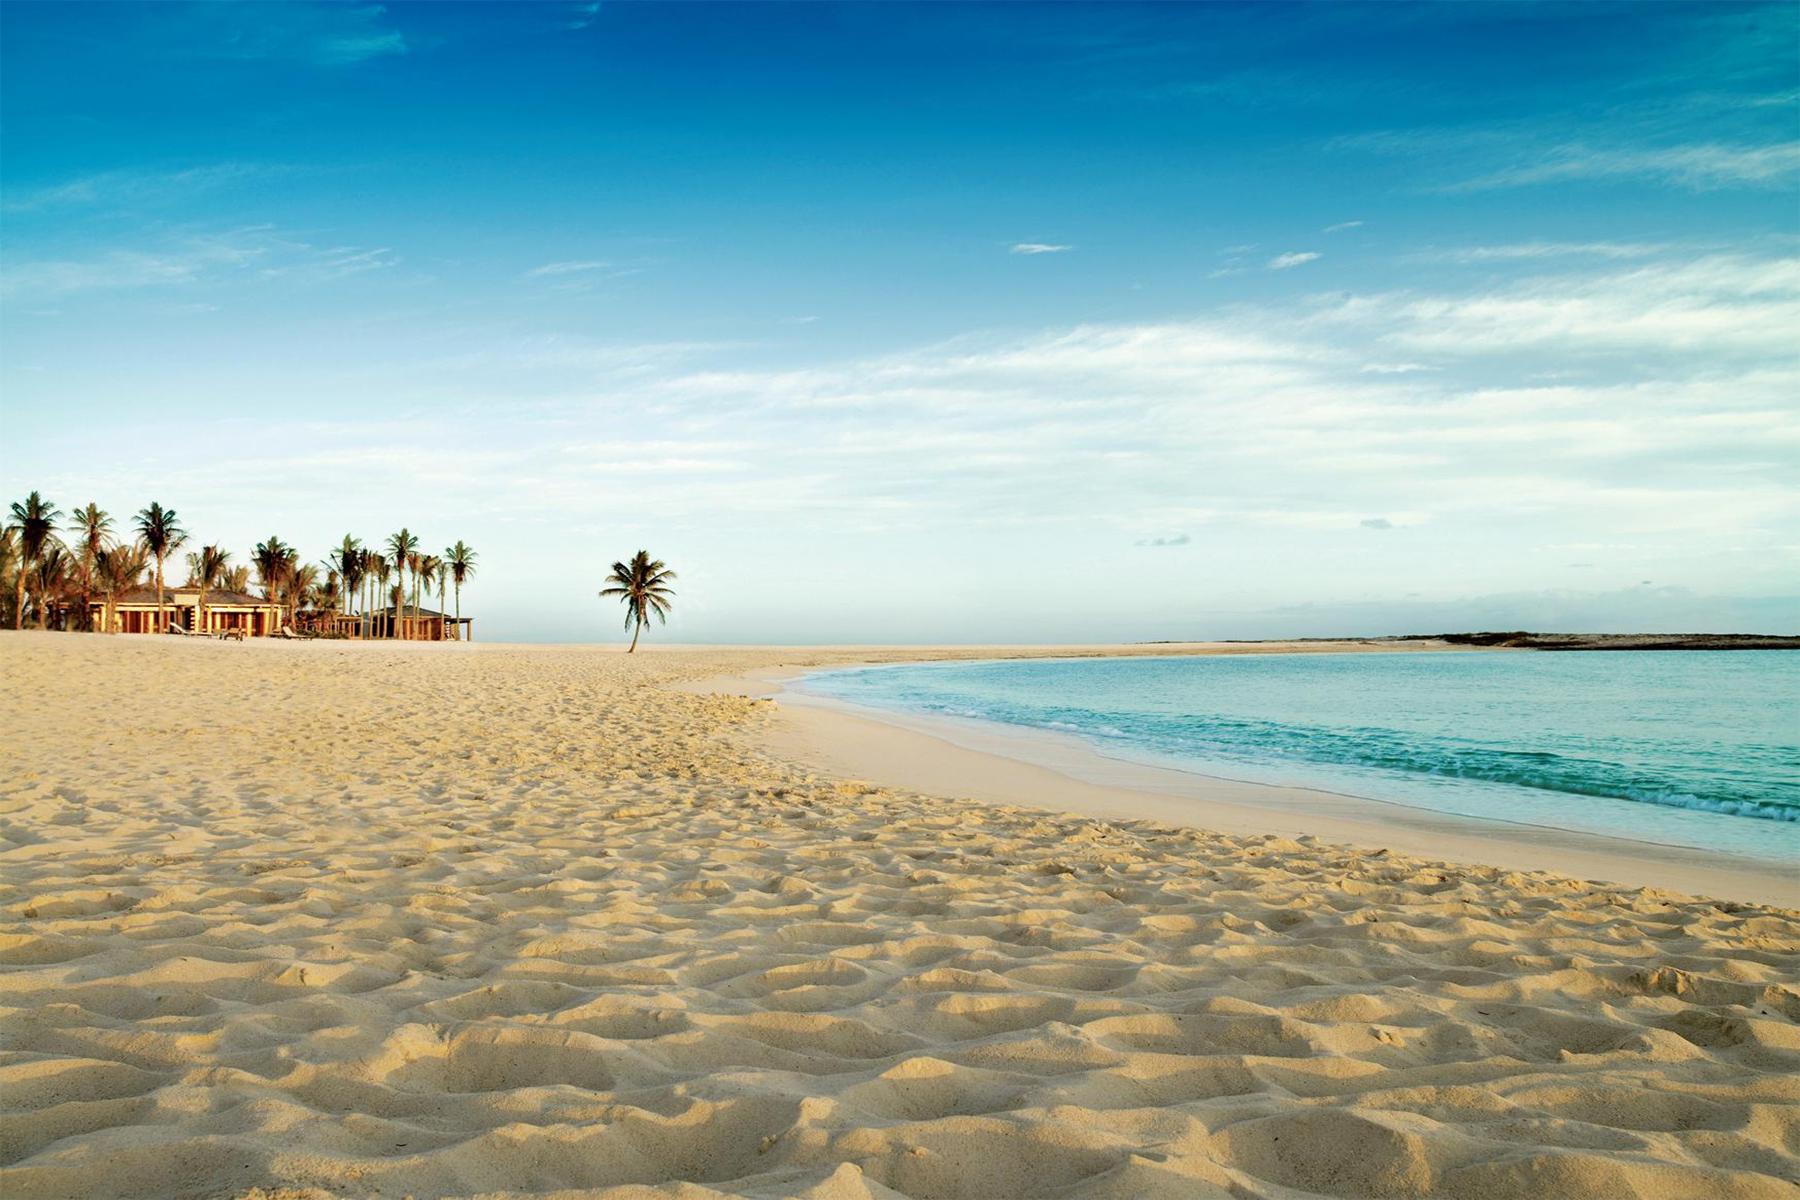 Additional photo for property listing at The Reef at Atlantis, 15-926 & 928 The Reef At Atlantis, Paradise Island, Nassau And Paradise Island Bahamas